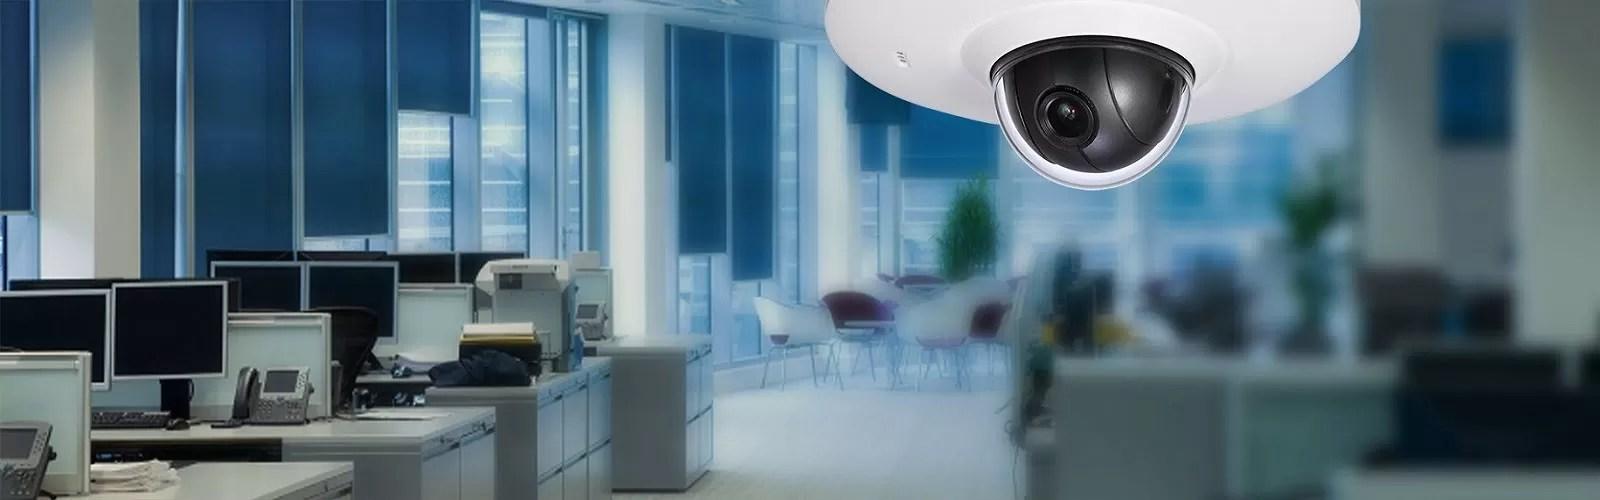 BBG security camera Whitby